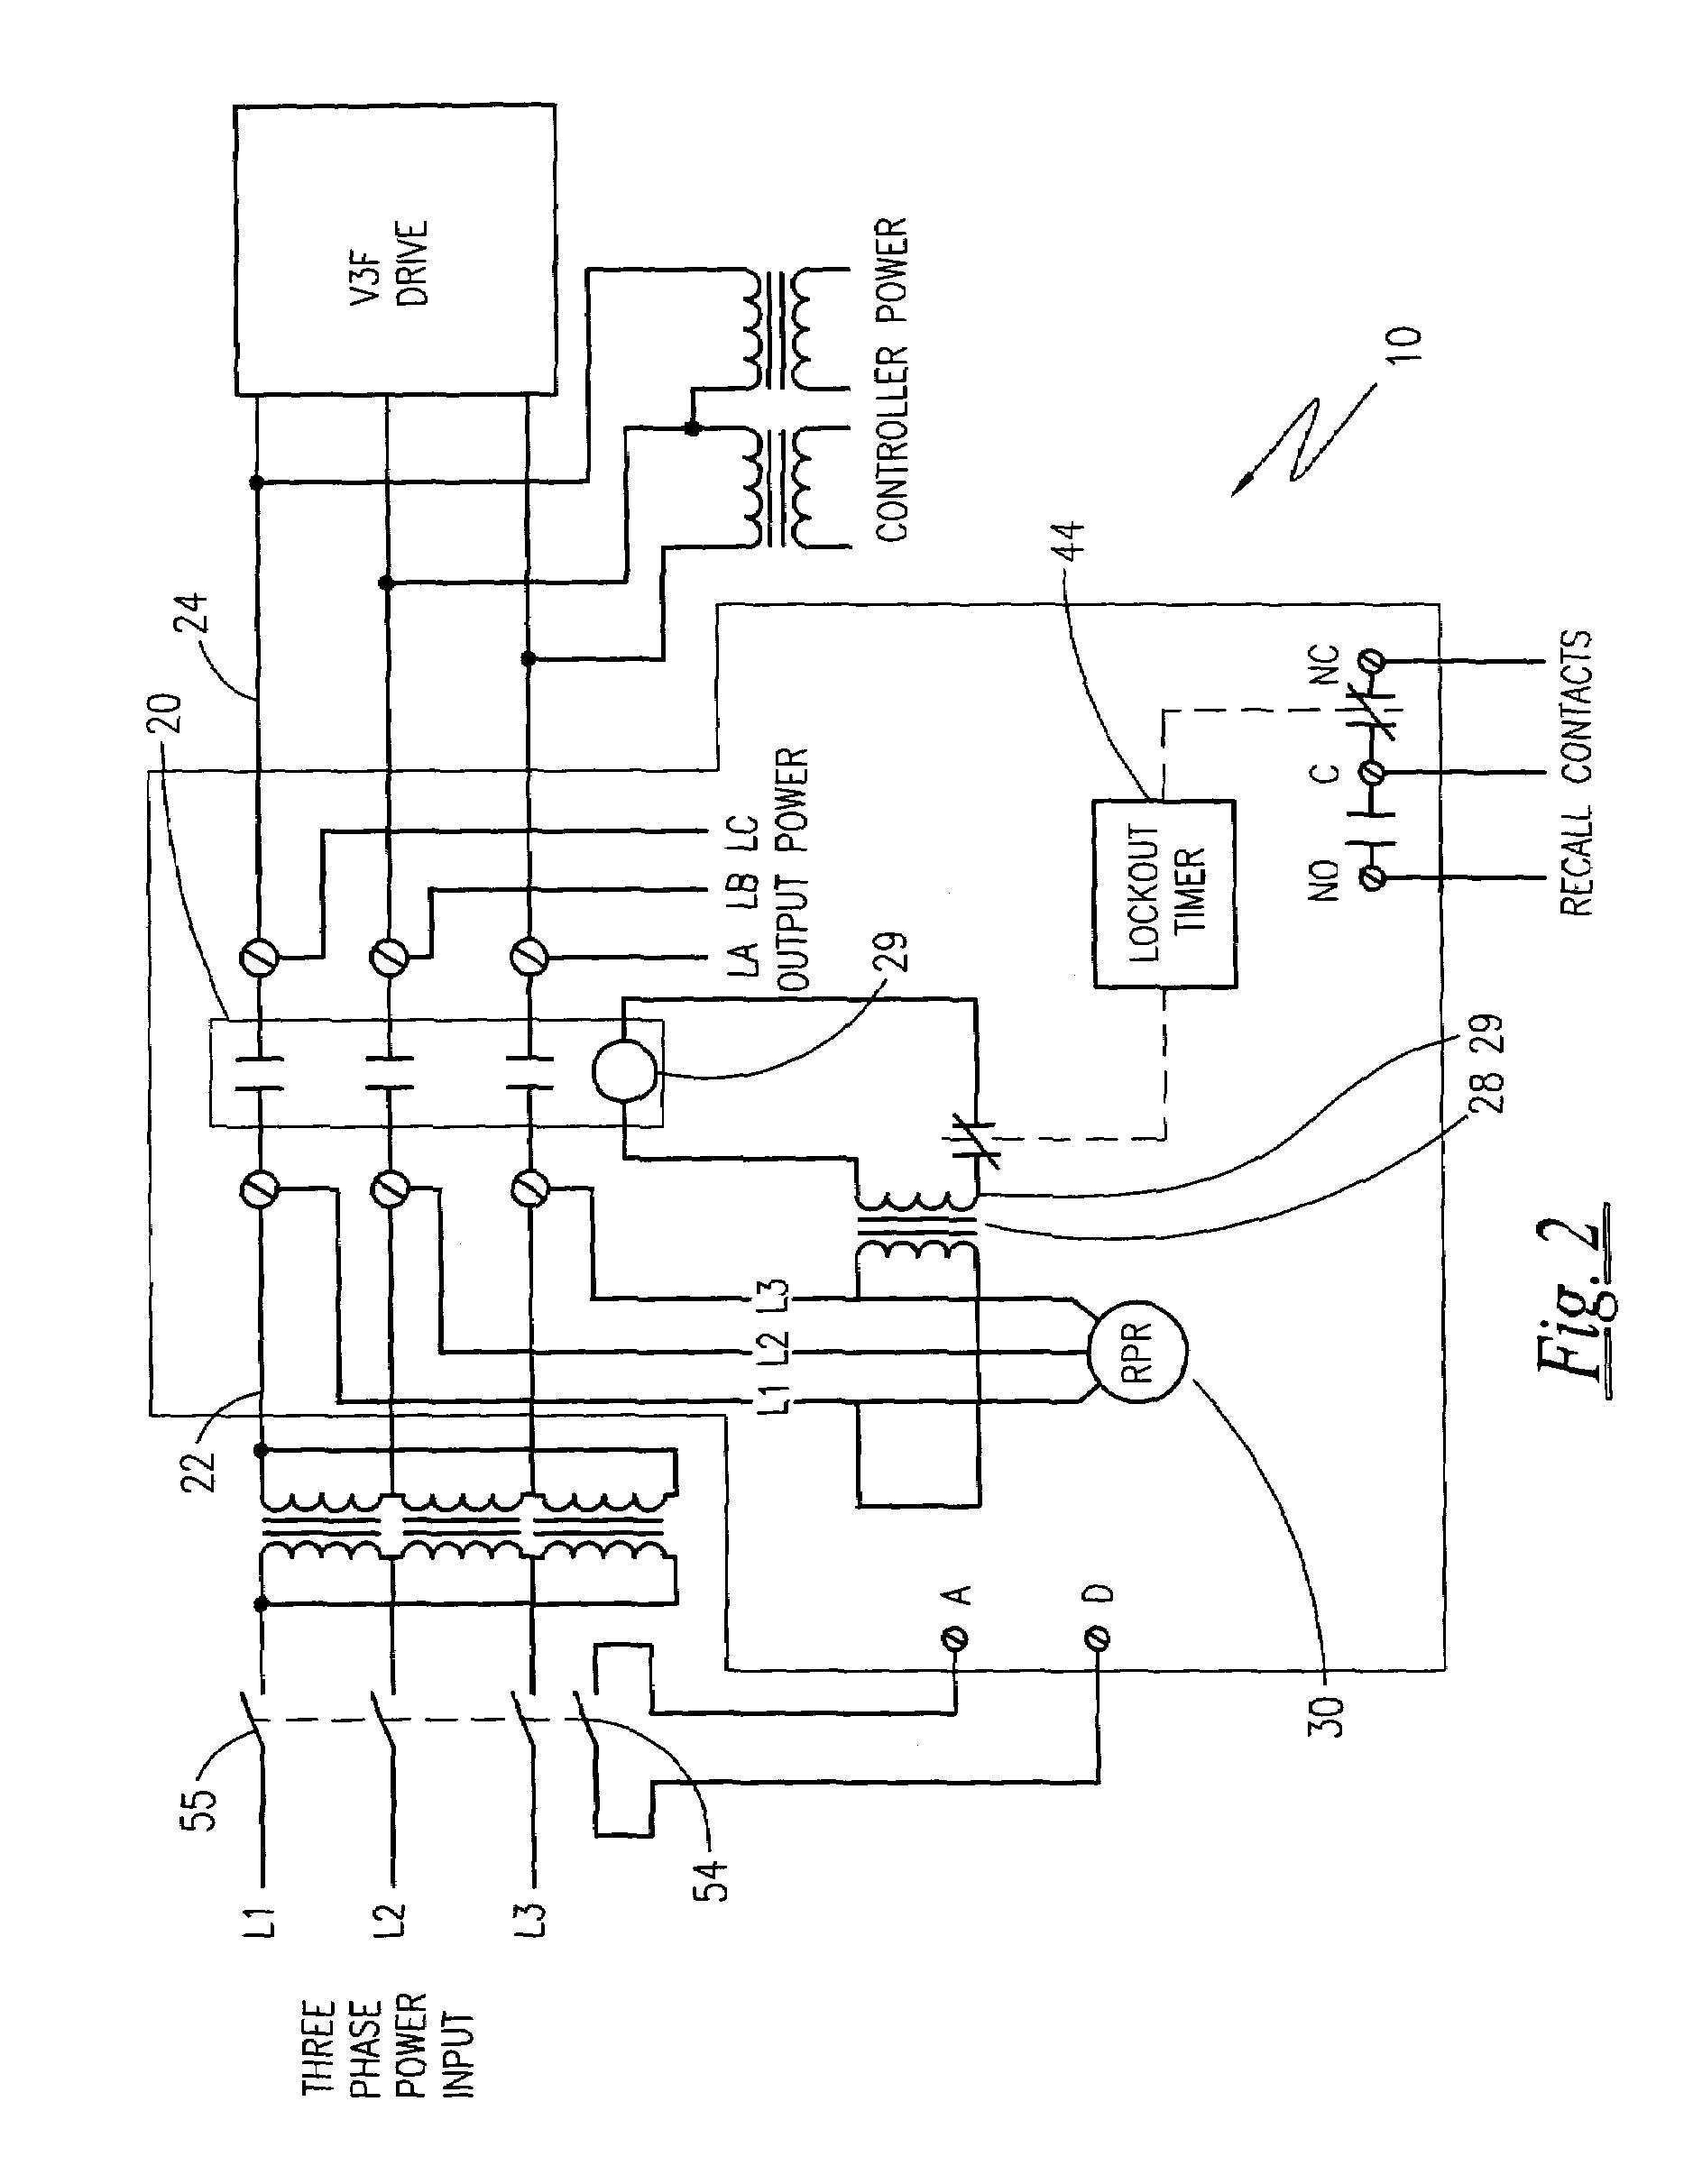 12 volt electric hydraulic pump wiring diagram stop start jog haldex winch